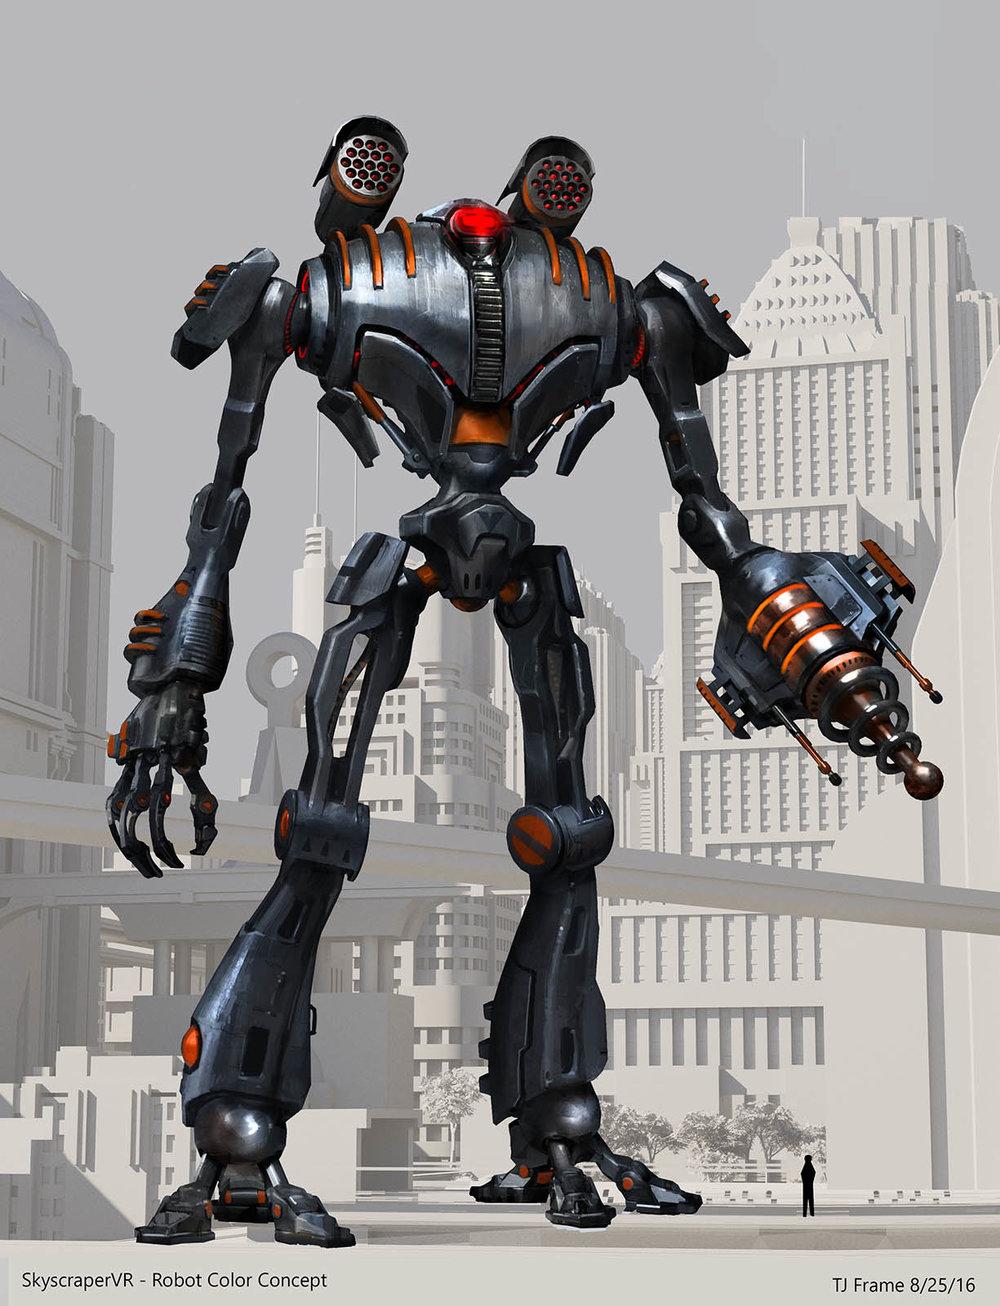 TJFRame-Art_GearVR_RetroRobotColor.jpg